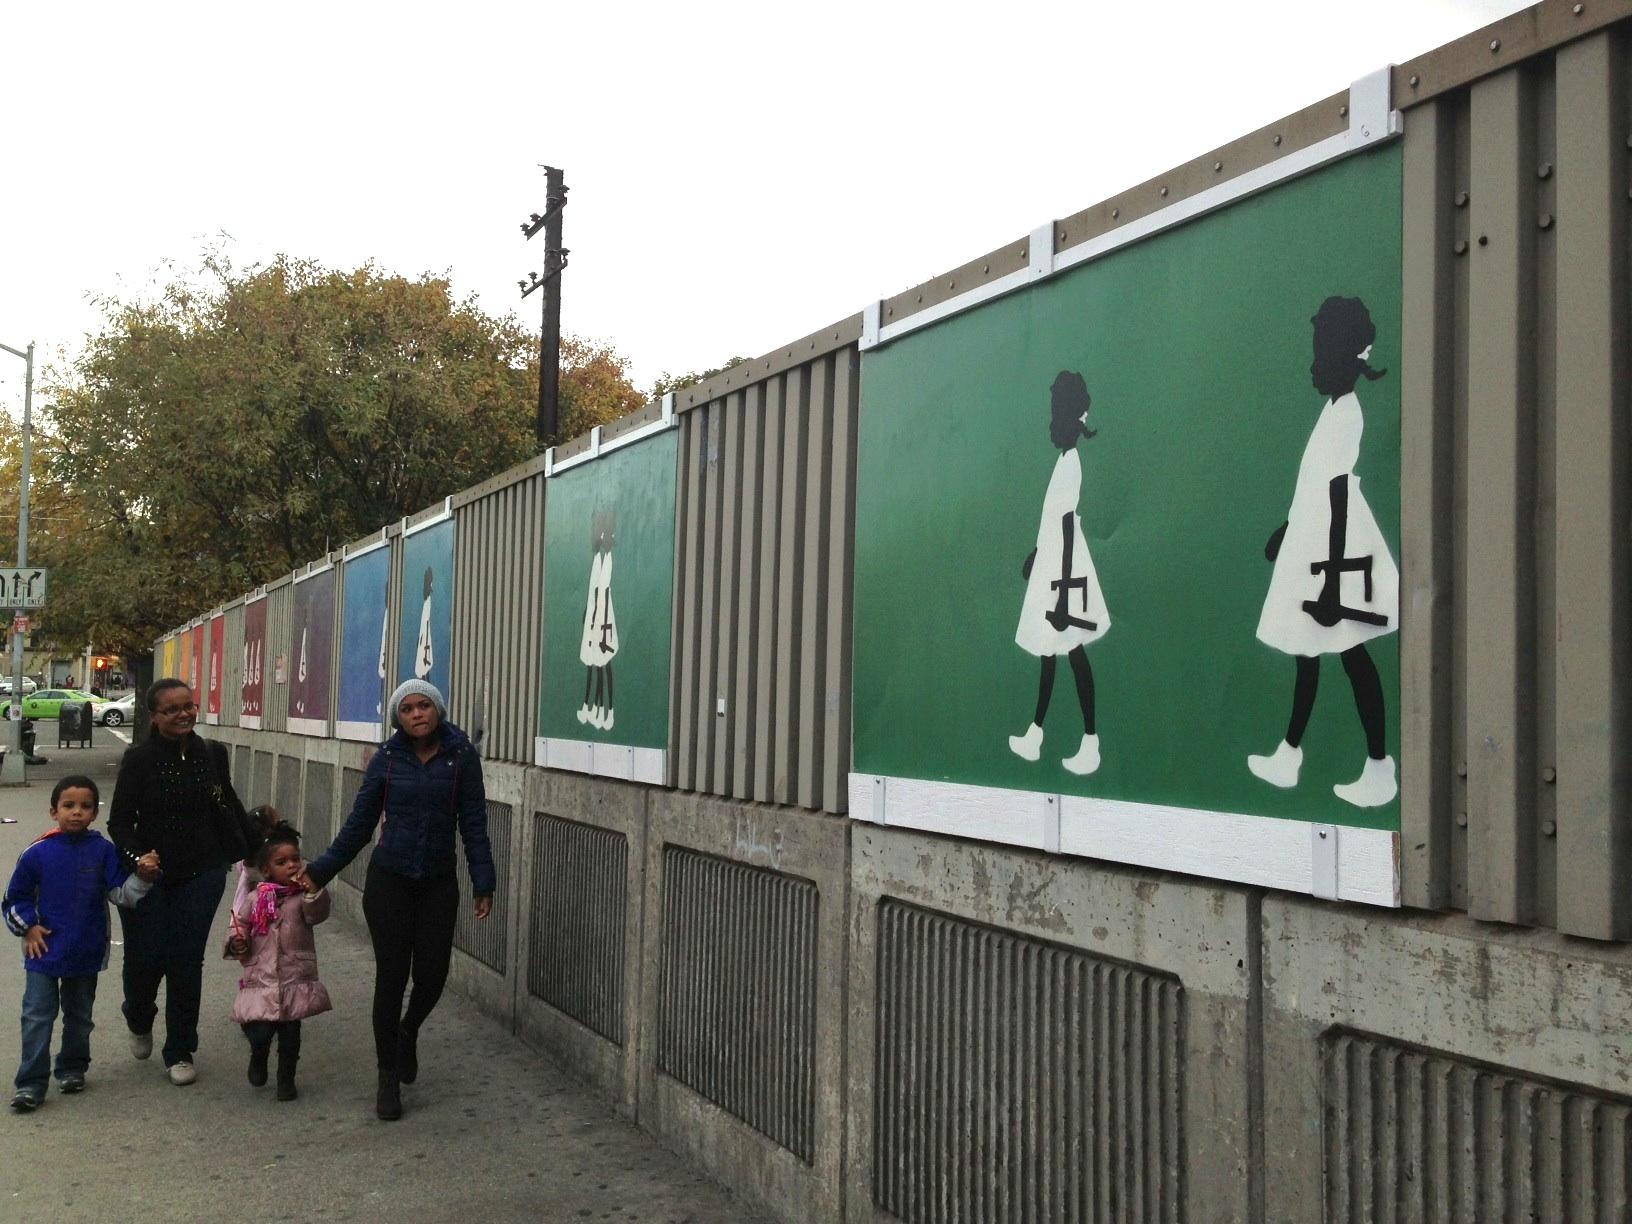 New mural evokes civil rights theme